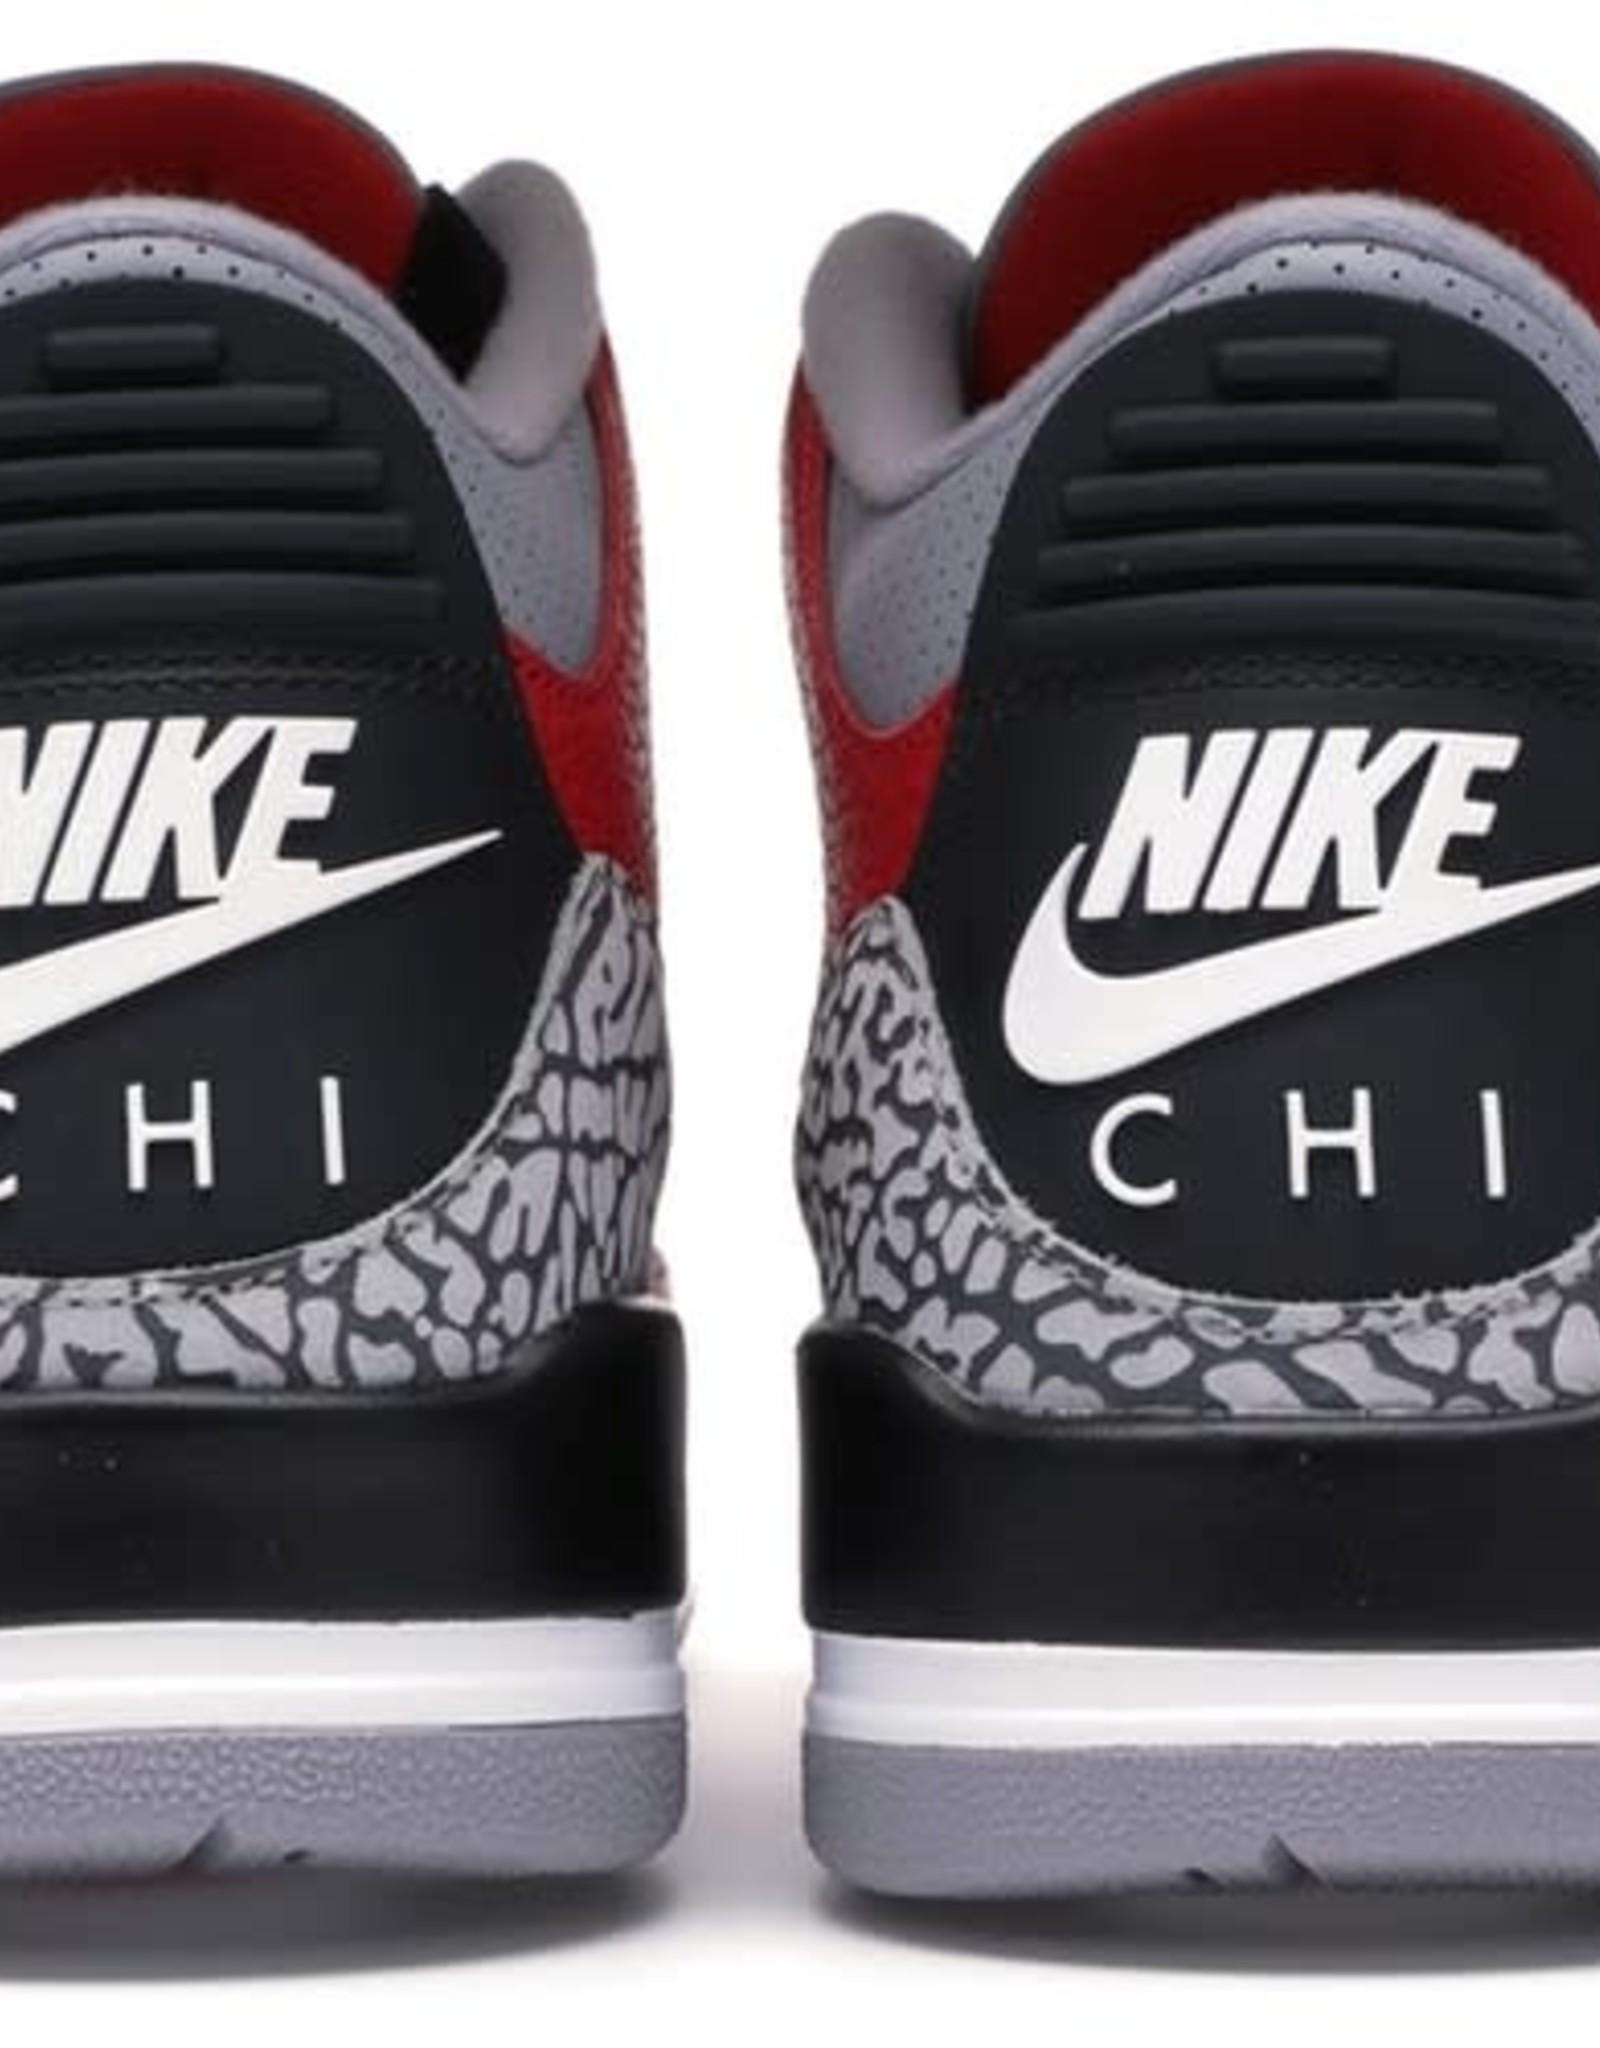 JORDAN DOUSED-Jordan 3 Retro Fire Red Cement (Nike Chi)